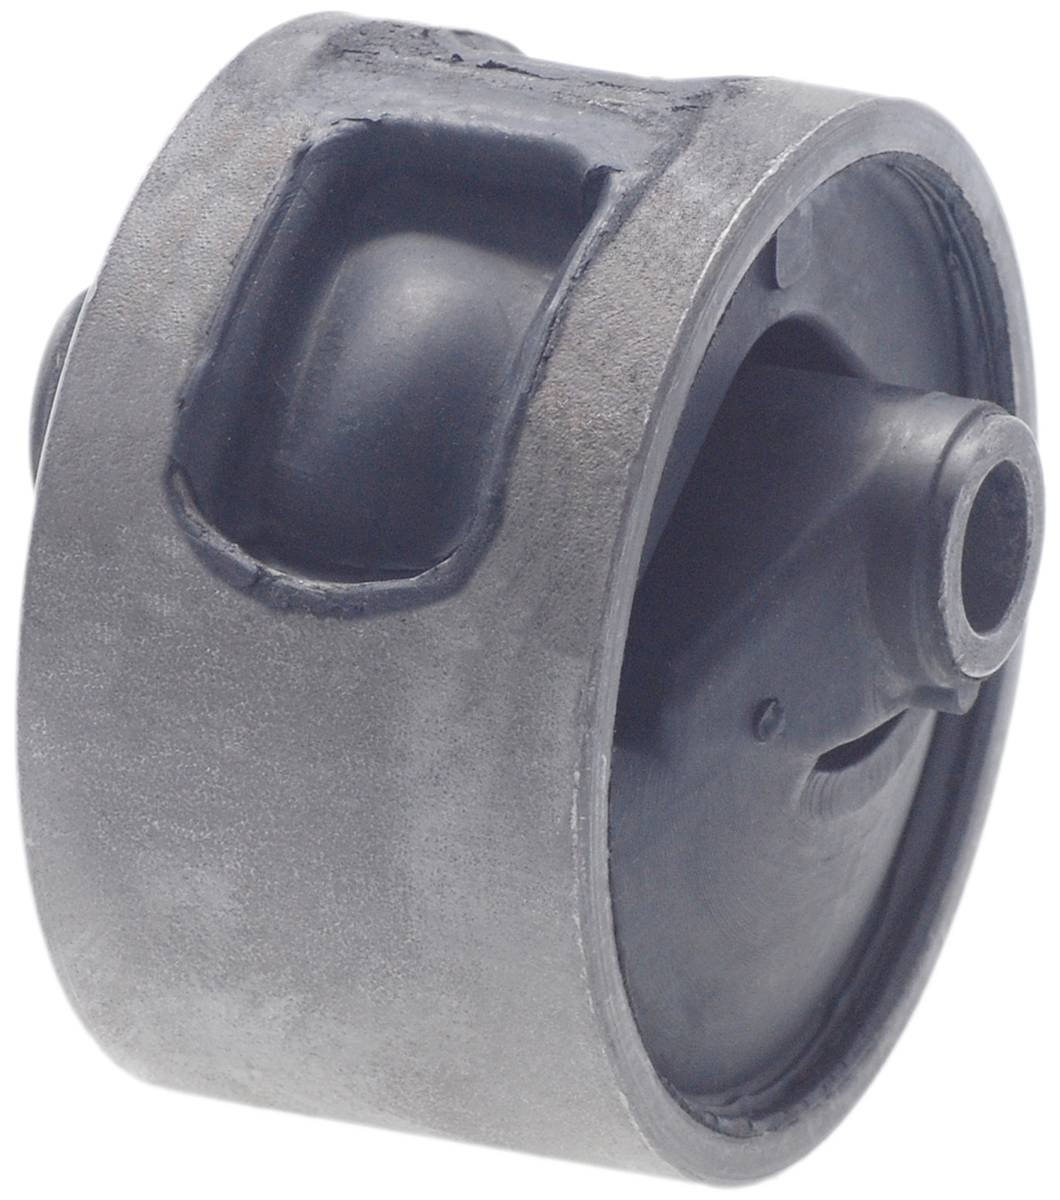 ARM BUSHING LEFT ENGINE MOUNT - Febest # MMB-EA5ALH - 1 Year Warranty